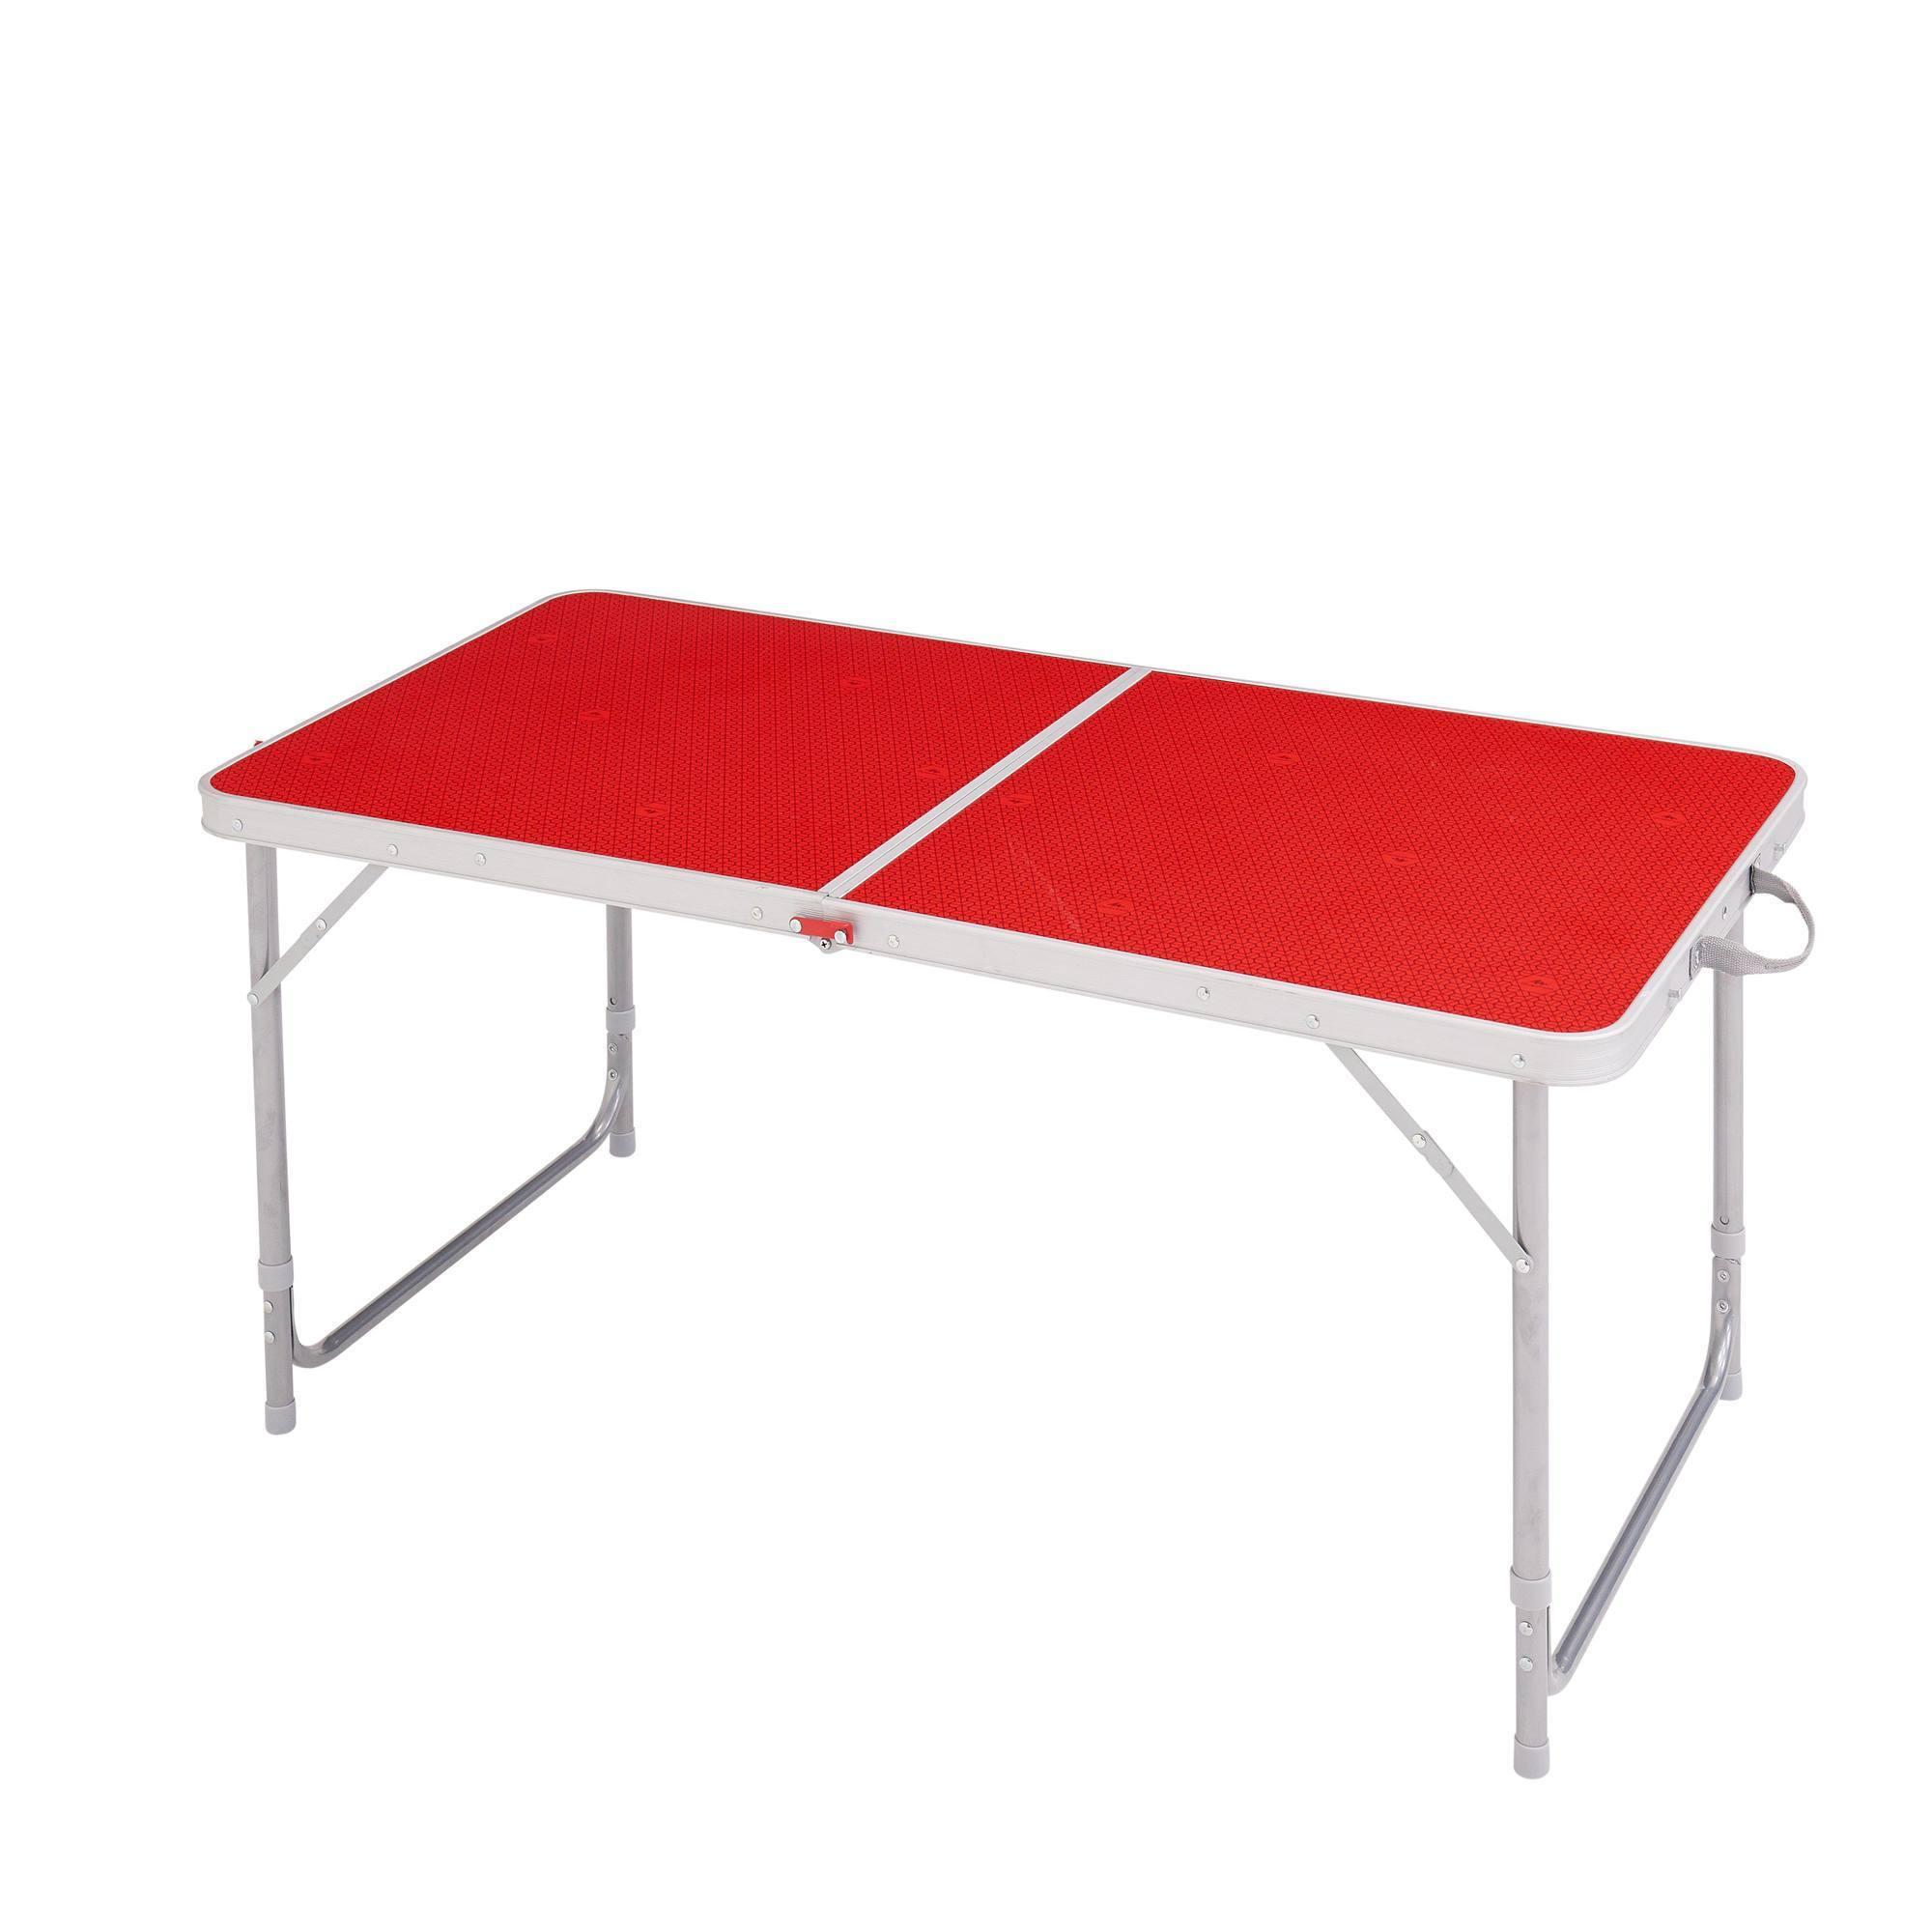 table de camping 4 ou 6 personnes clubs collectivit s decathlon pro. Black Bedroom Furniture Sets. Home Design Ideas